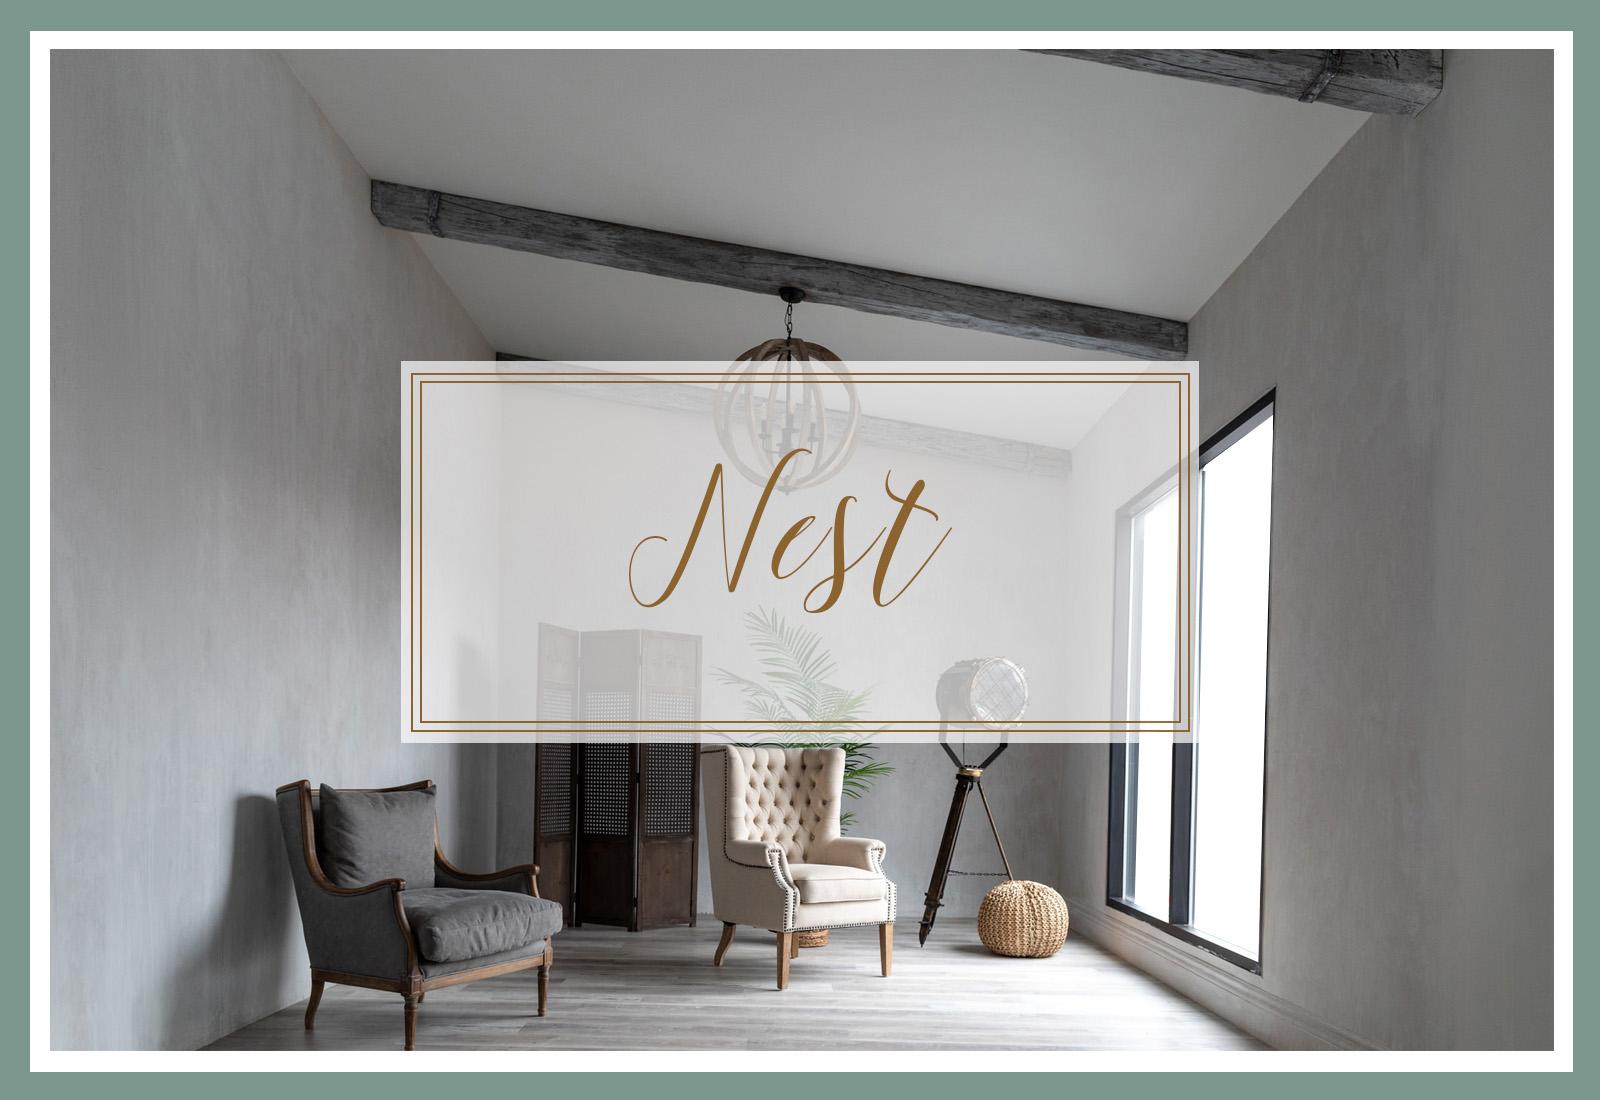 Nest Studio navigation